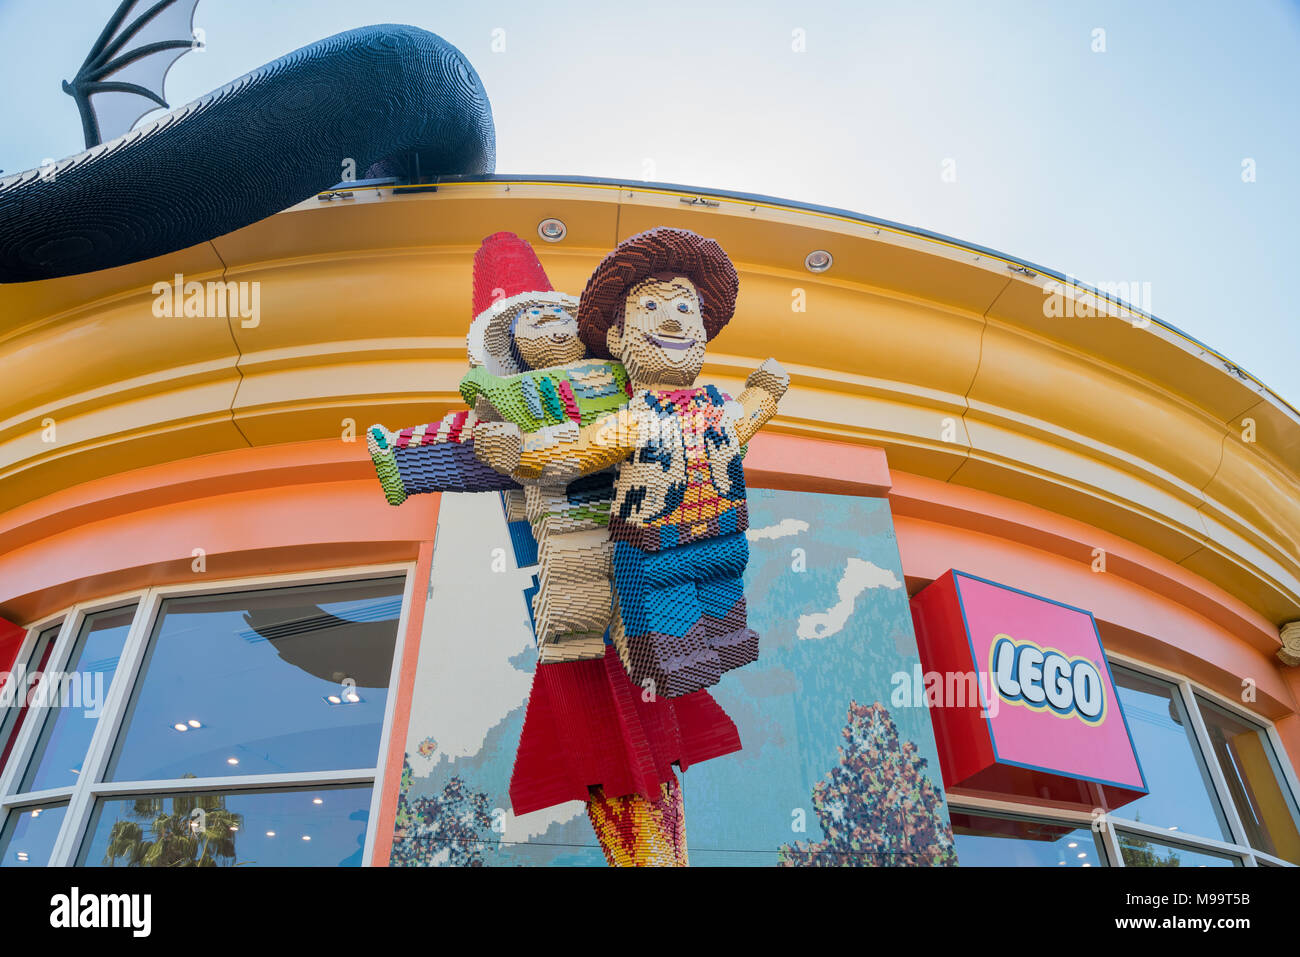 Exterior Of Disney Store Stock Photos Exterior Of Disney Store